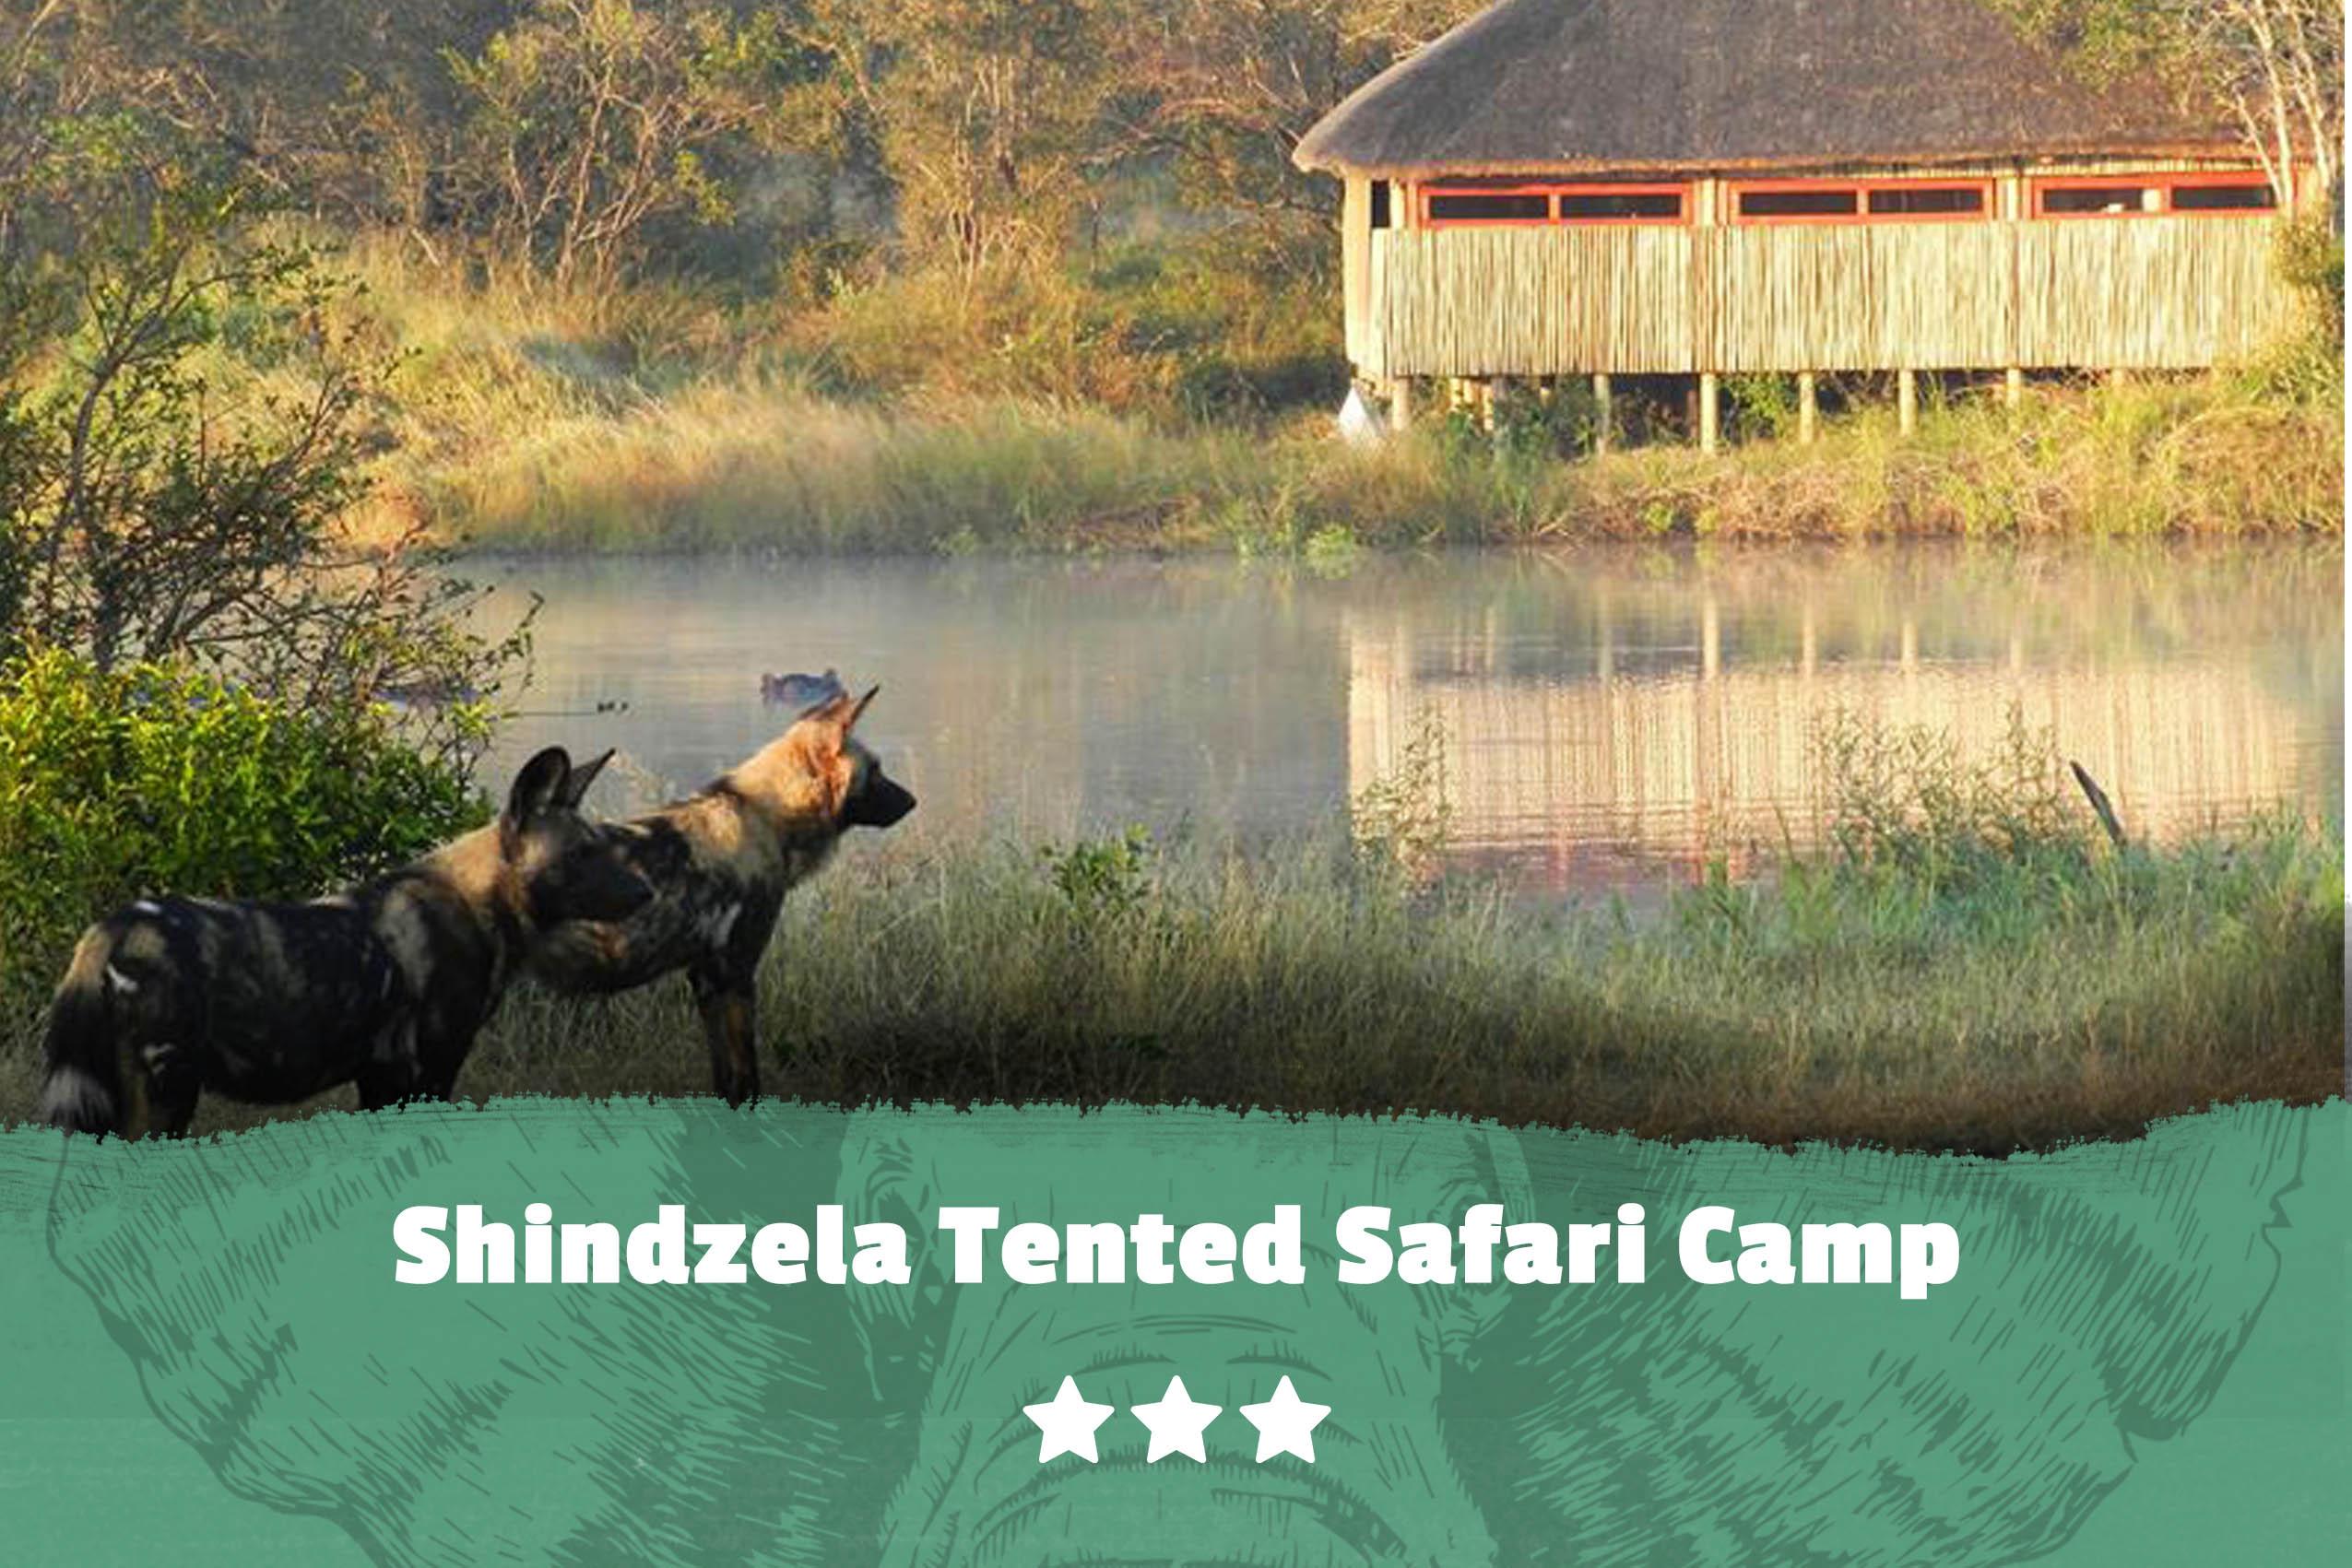 Kruger featured image Shindzela Tented Safari Camp